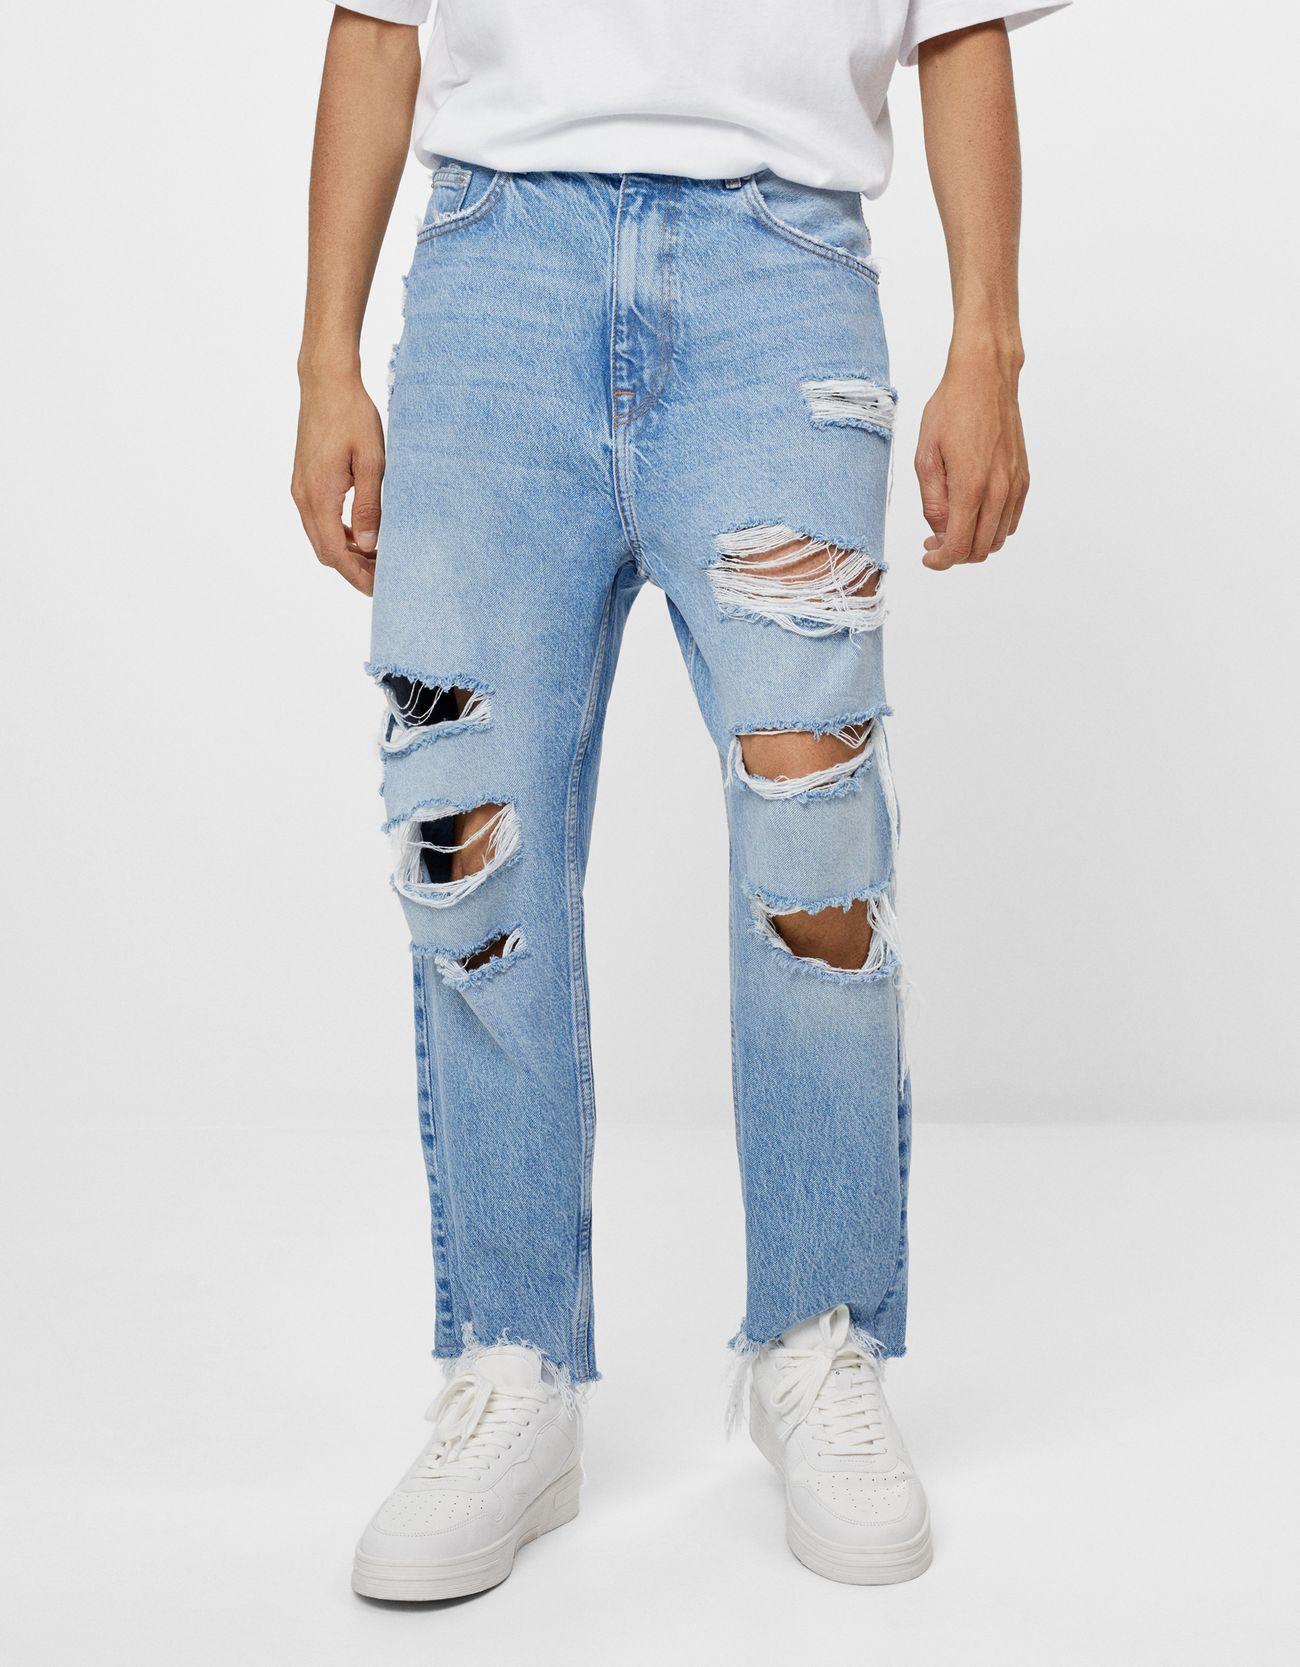 Jeans Loose Rotos Denim Hombre Bershka Jeans Hombre Rotos Chalecos De Moda Hombre Pantalon Roto Hombre